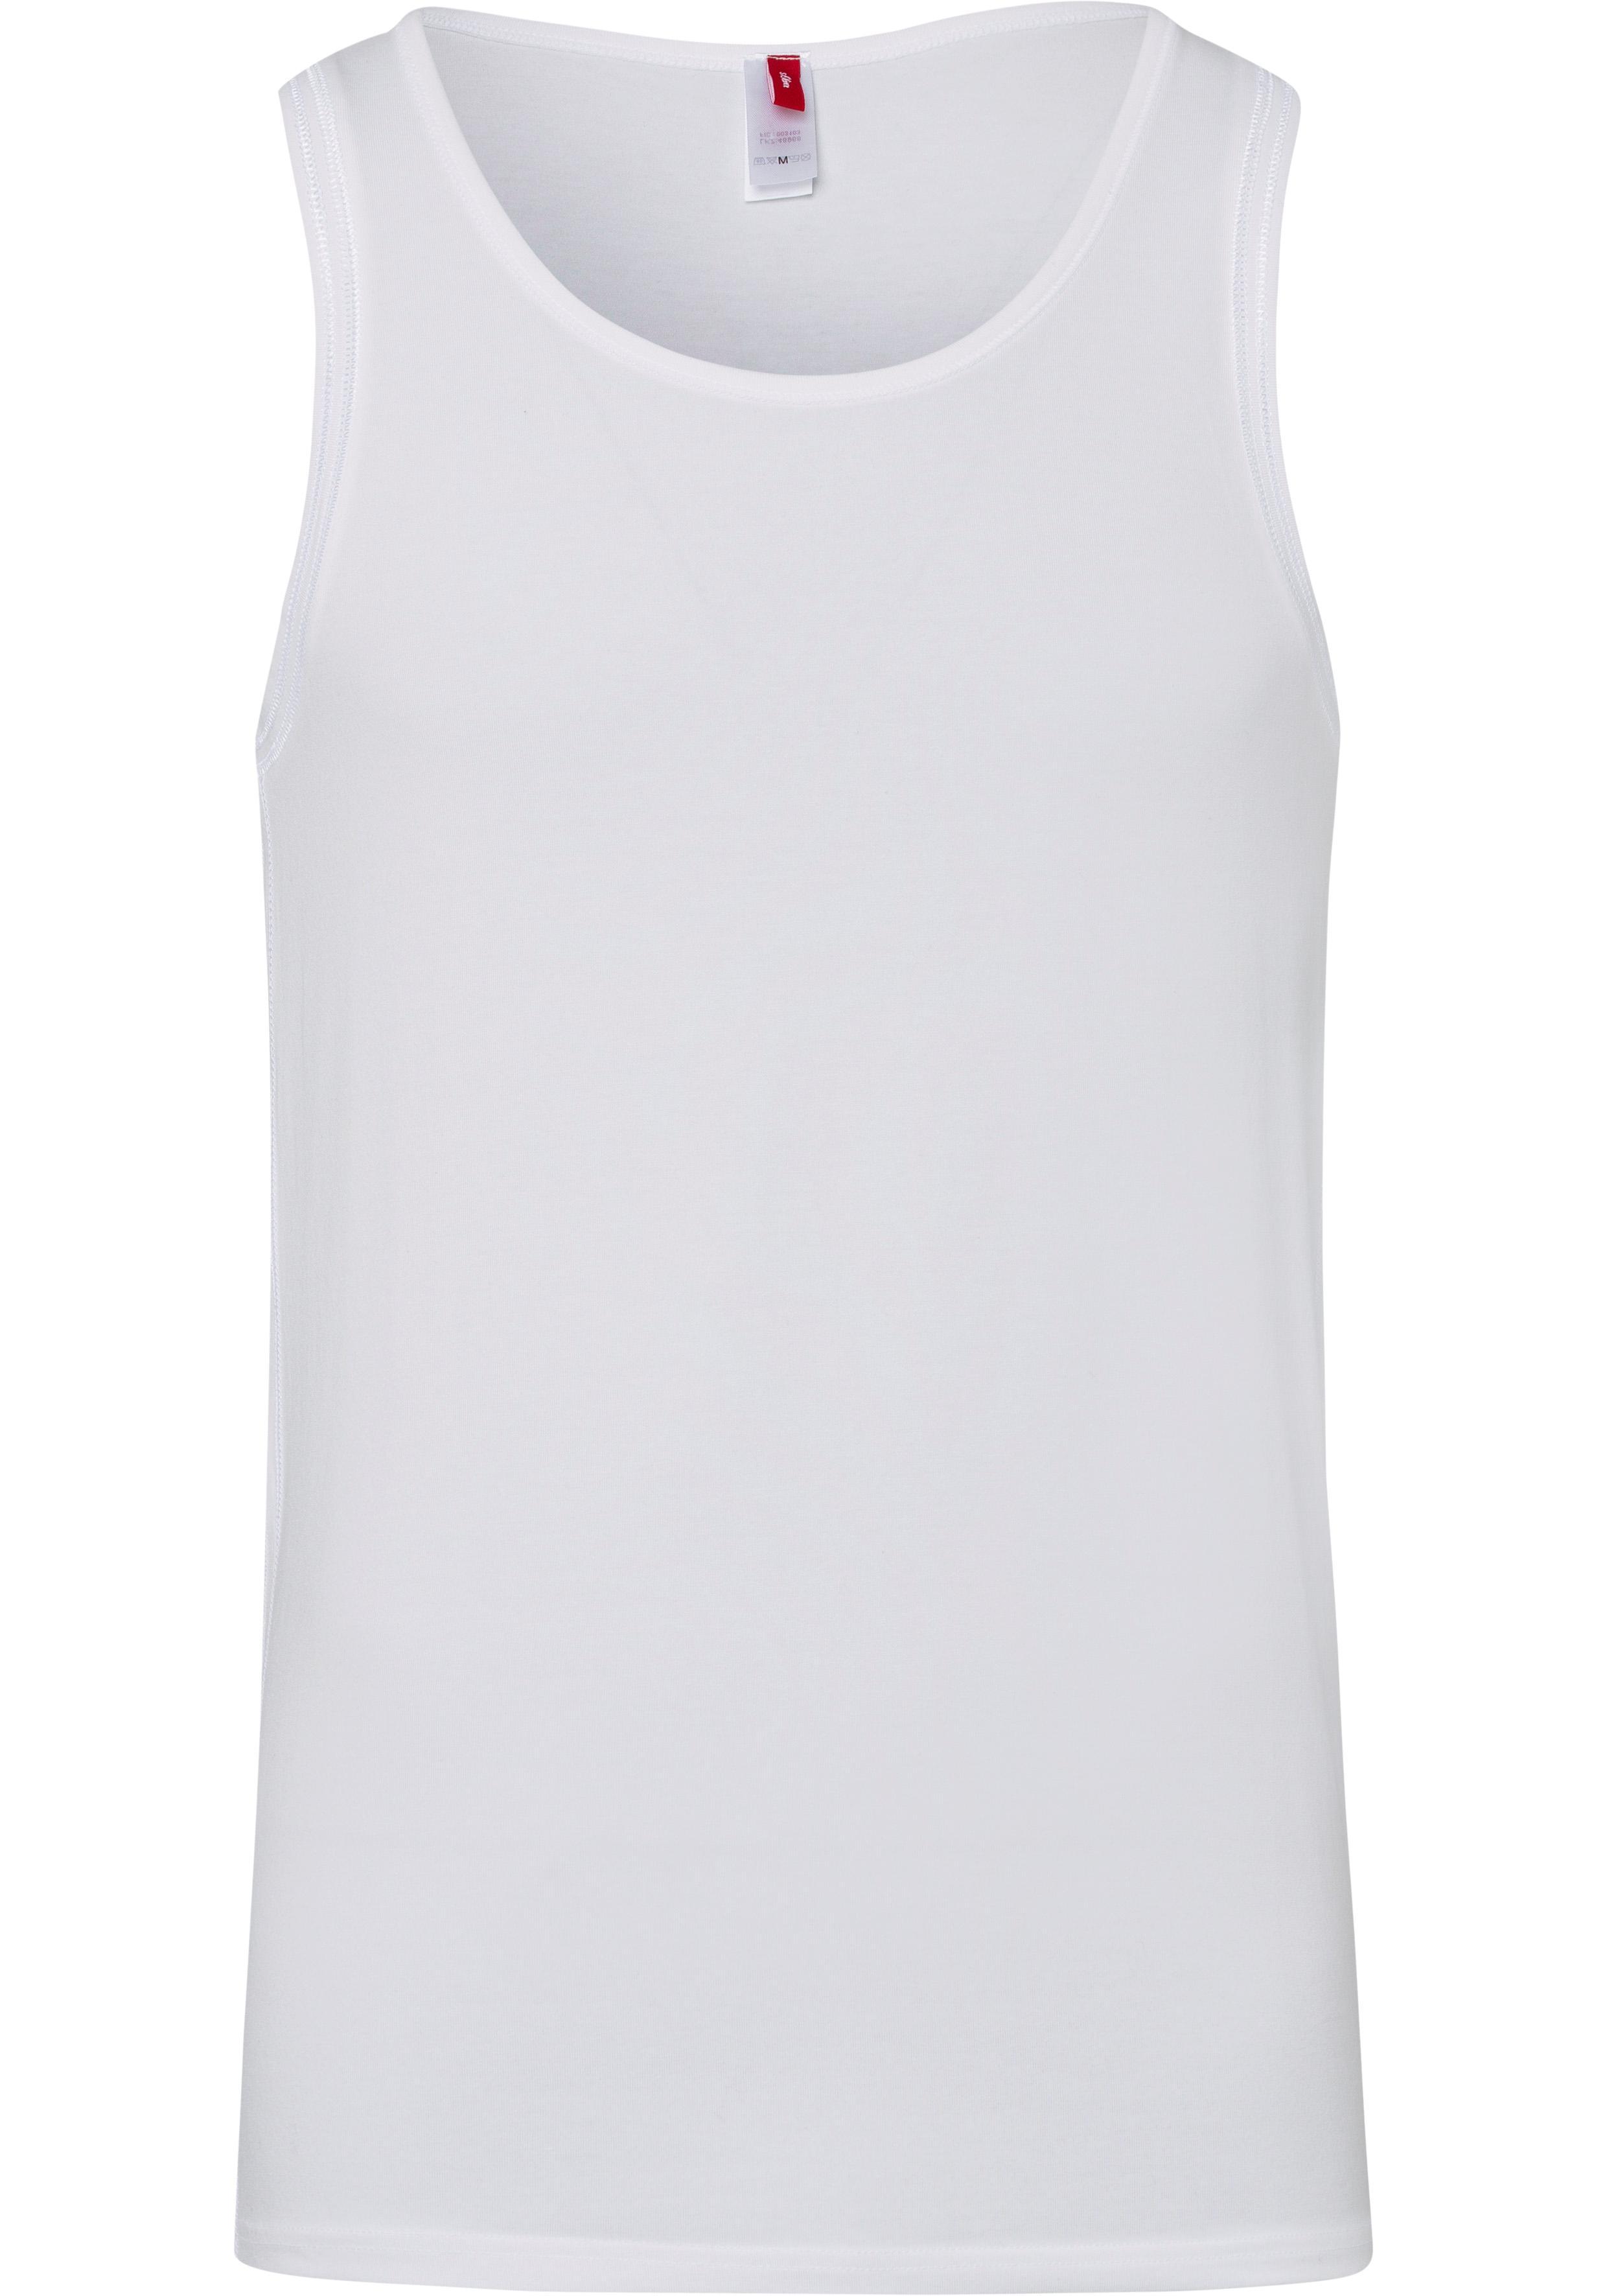 sOliver RED LABEL Bodywear Tanktop aus weichem Modal   Bekleidung > Shirts > Tank Tops   Weiß   Elasthan   S.Oliver Red Label